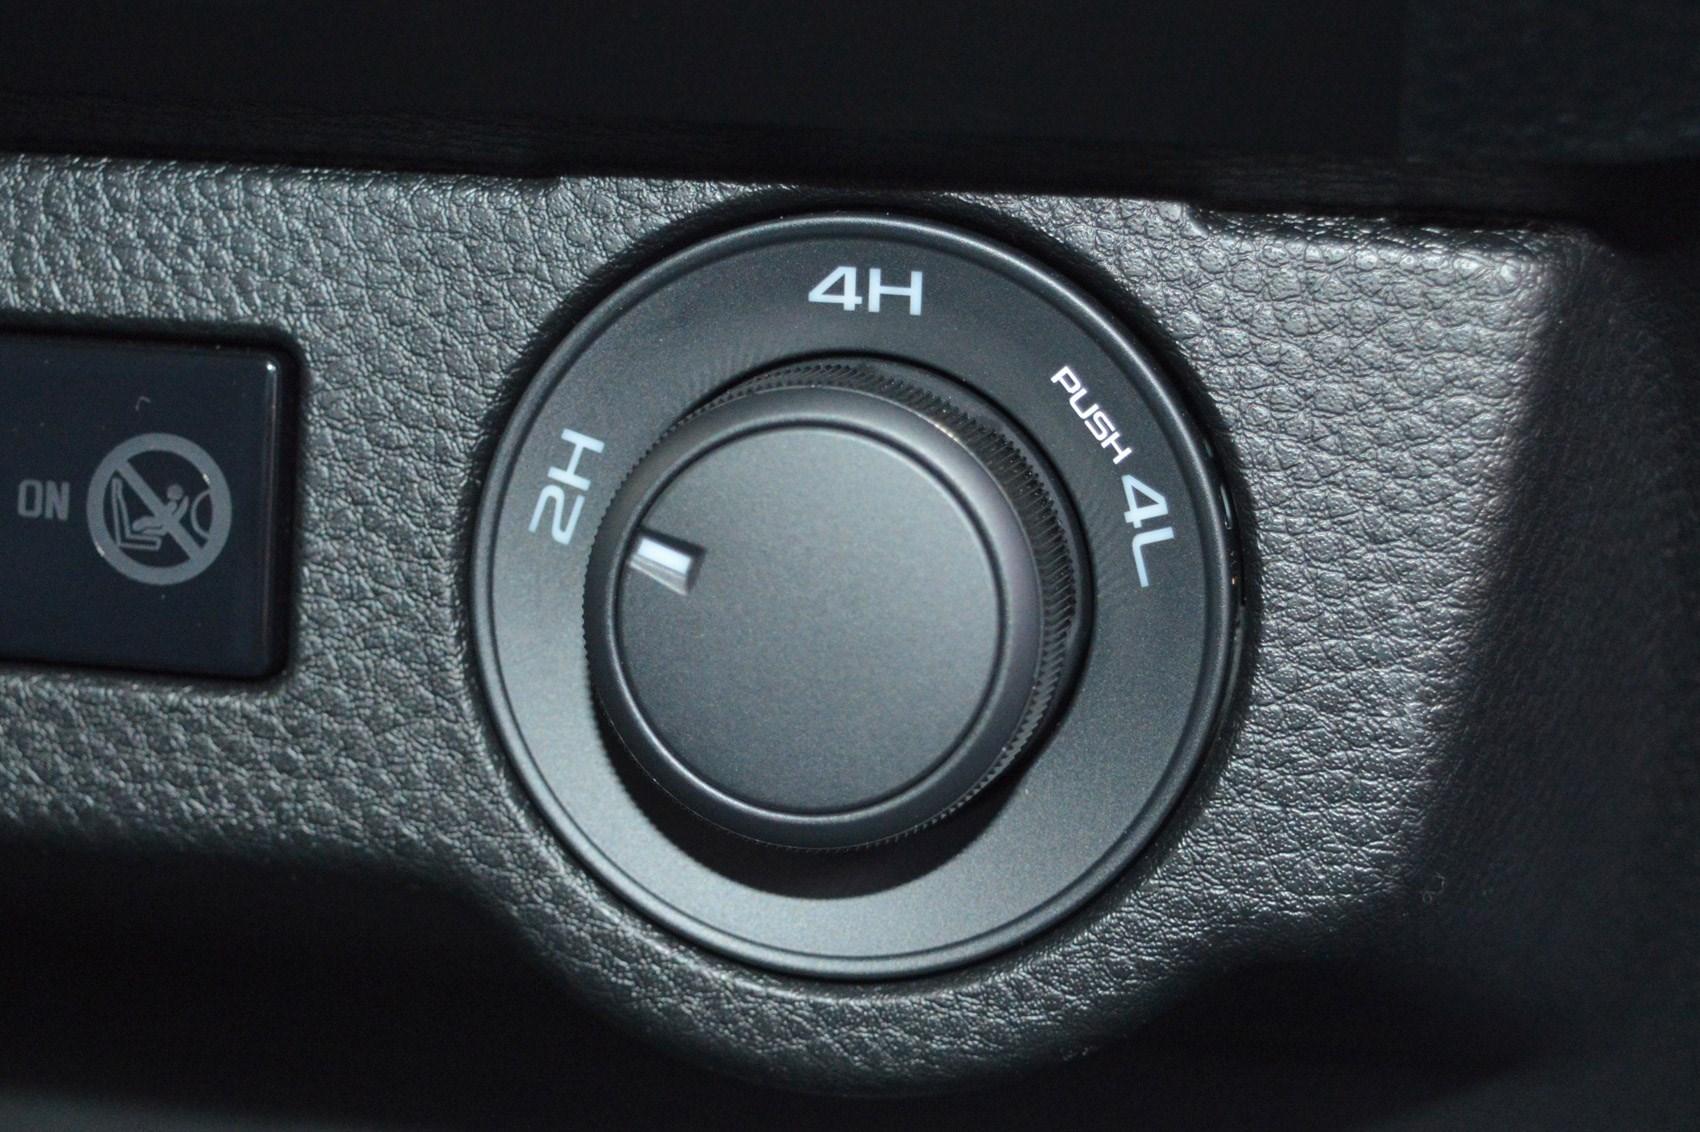 Isuzu D-Max review, 2021, four-wheel drive selector